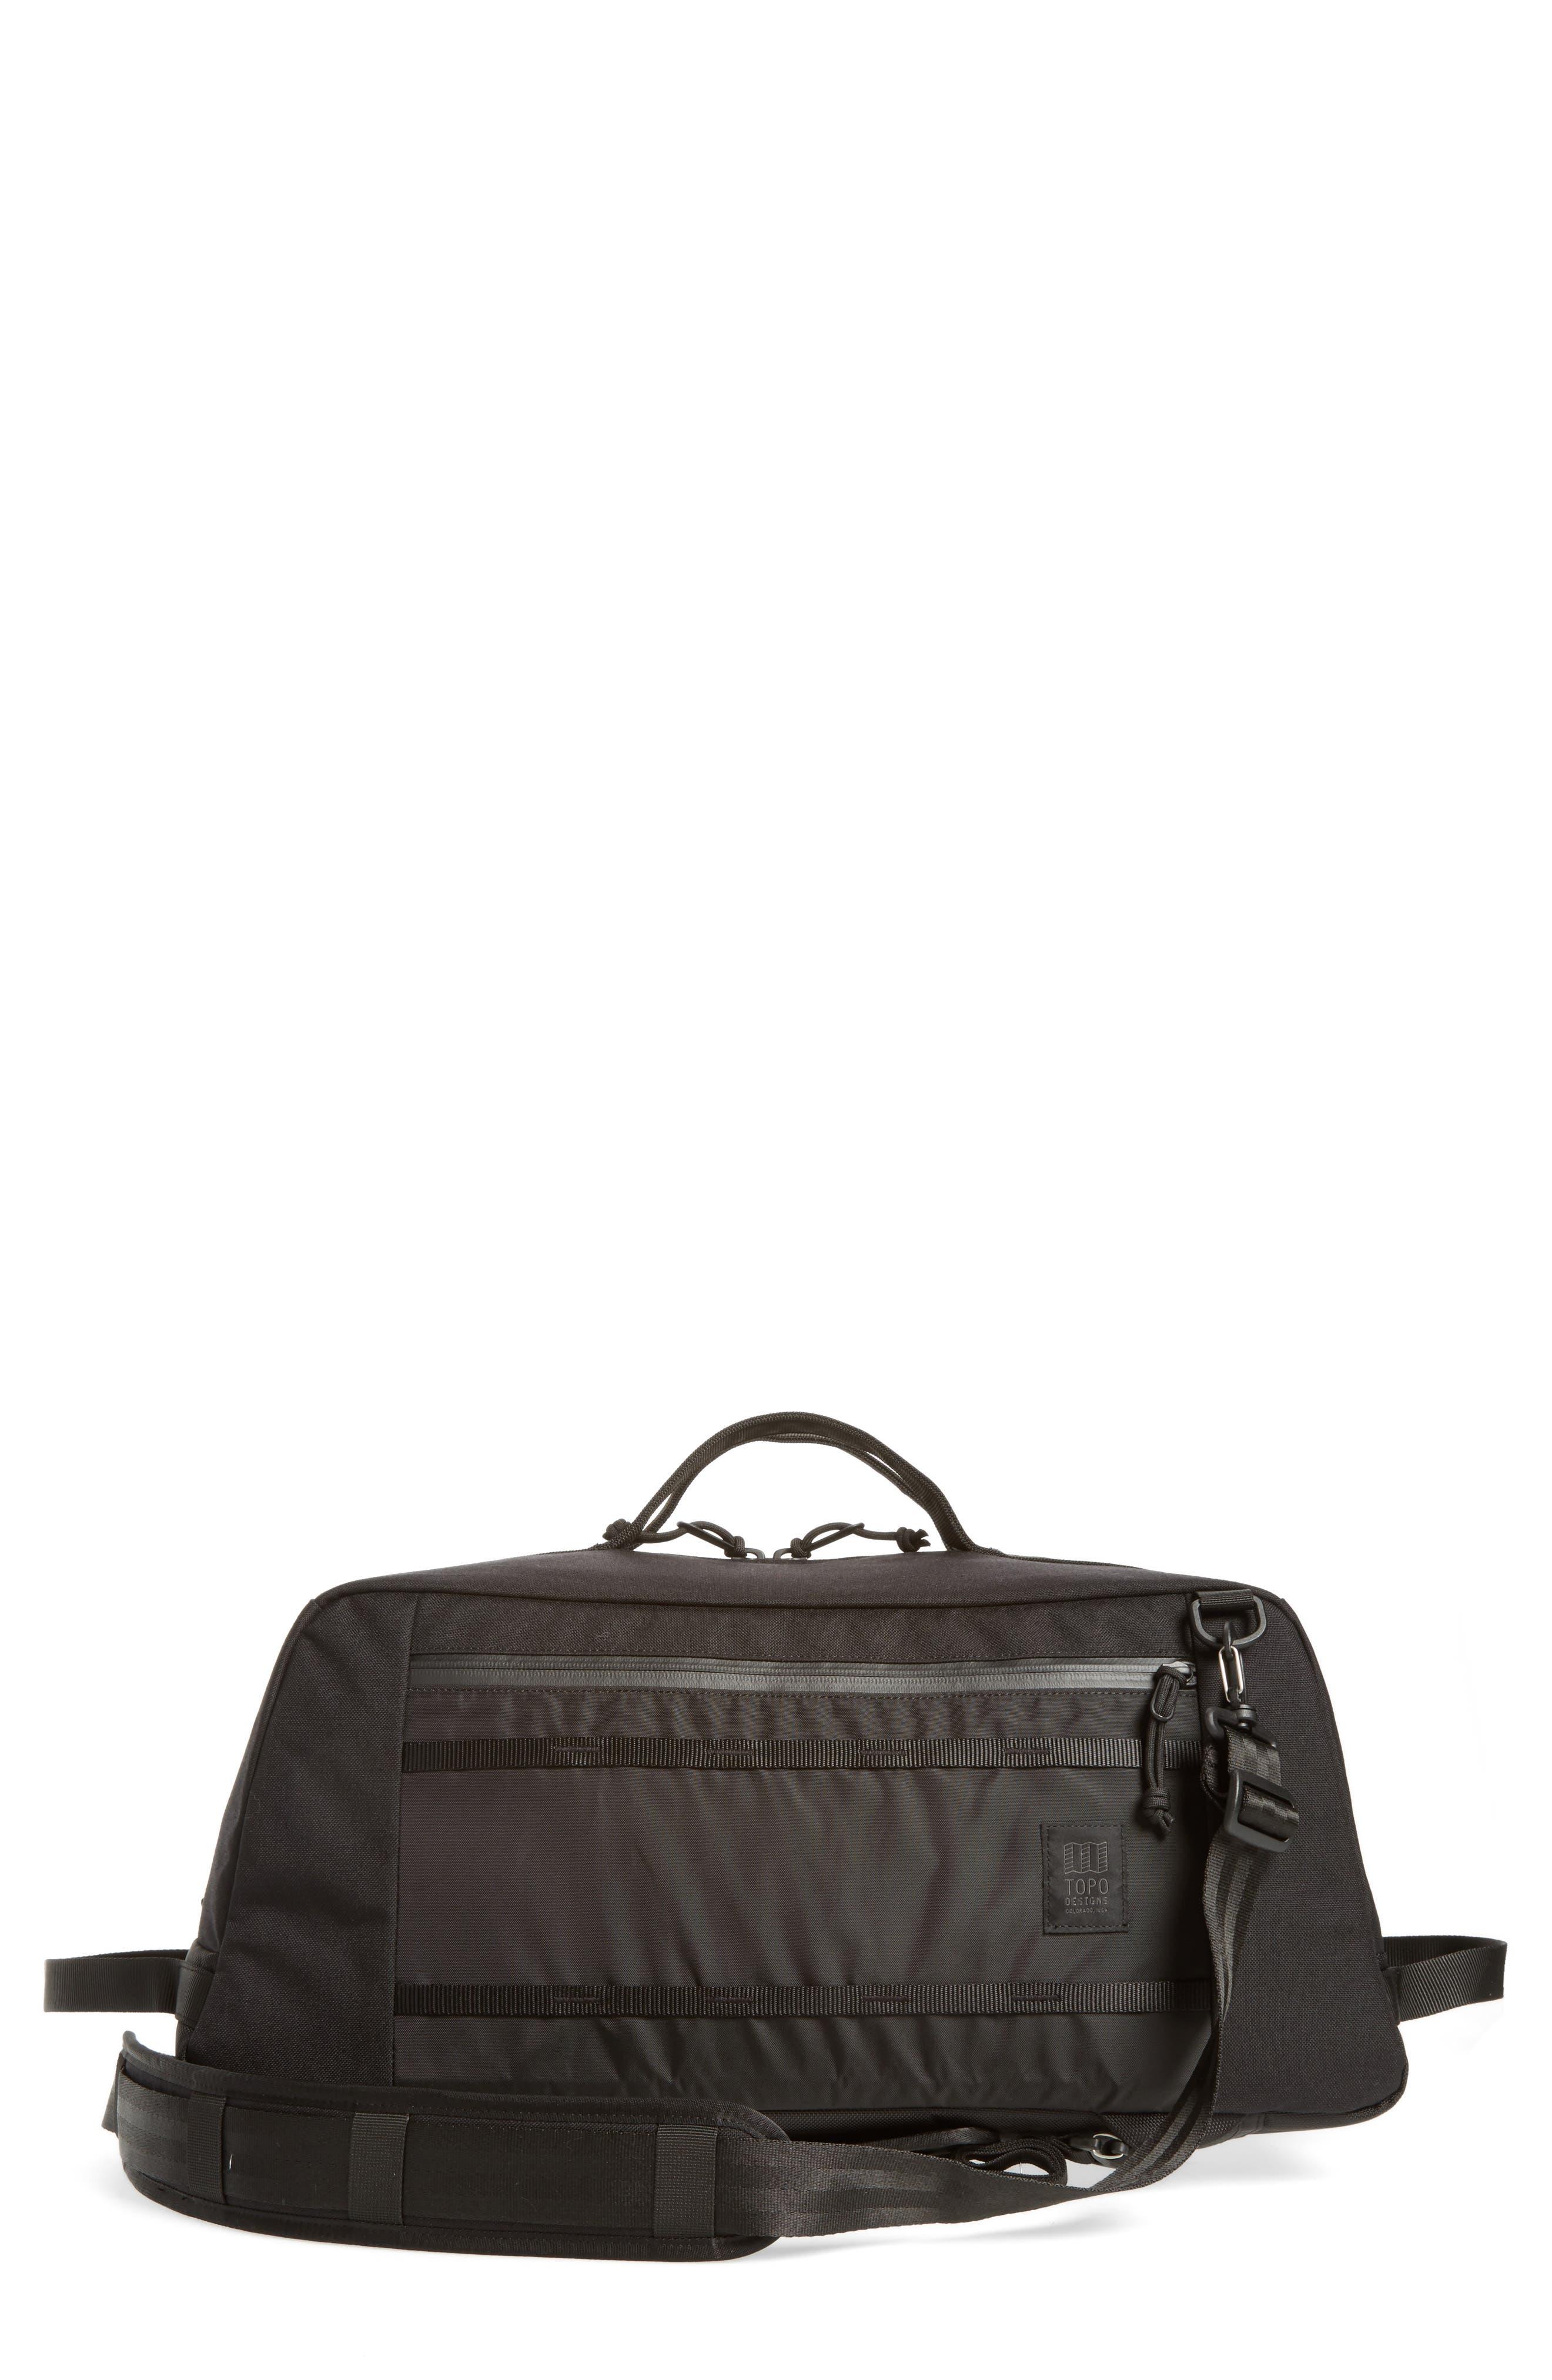 Main Image - Topo Designs Mountain Convertible Duffel Bag